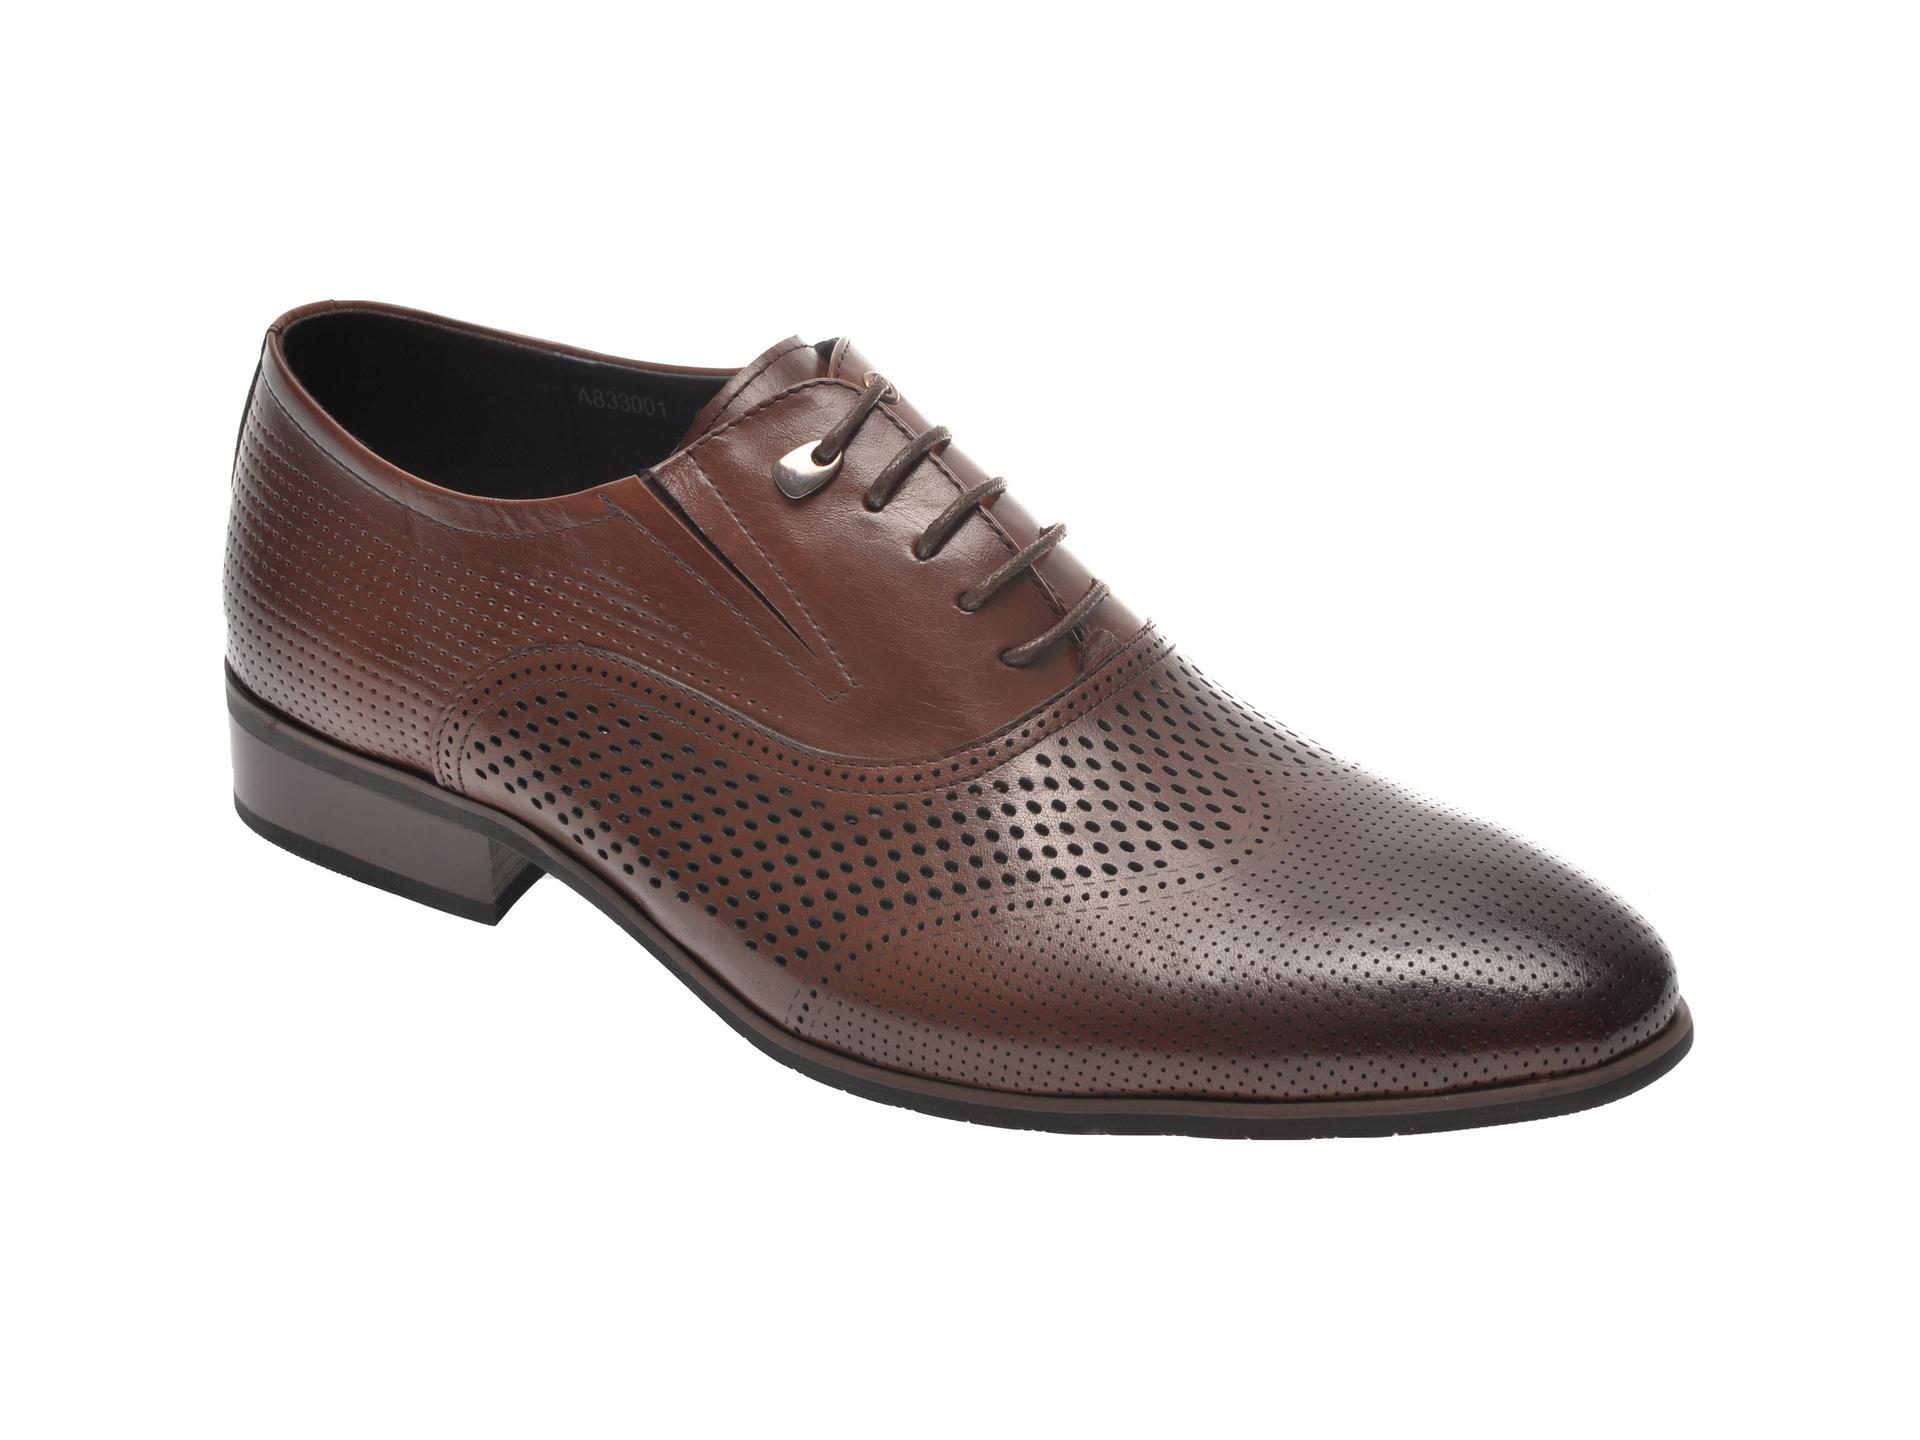 Pantofi OTTER maro, A833001, din piele naturala imagine